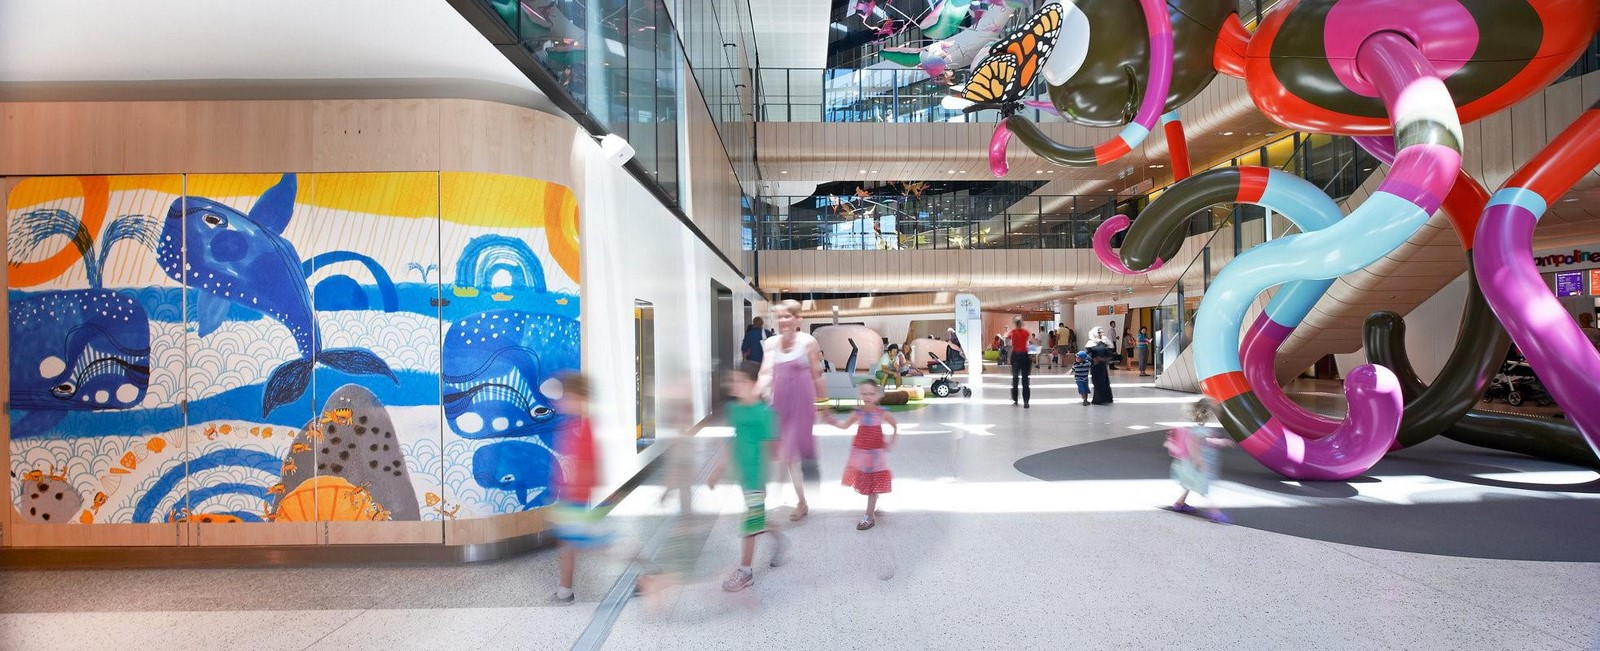 Royal Children's Hospital, Melbourne, Australia - Sheet2